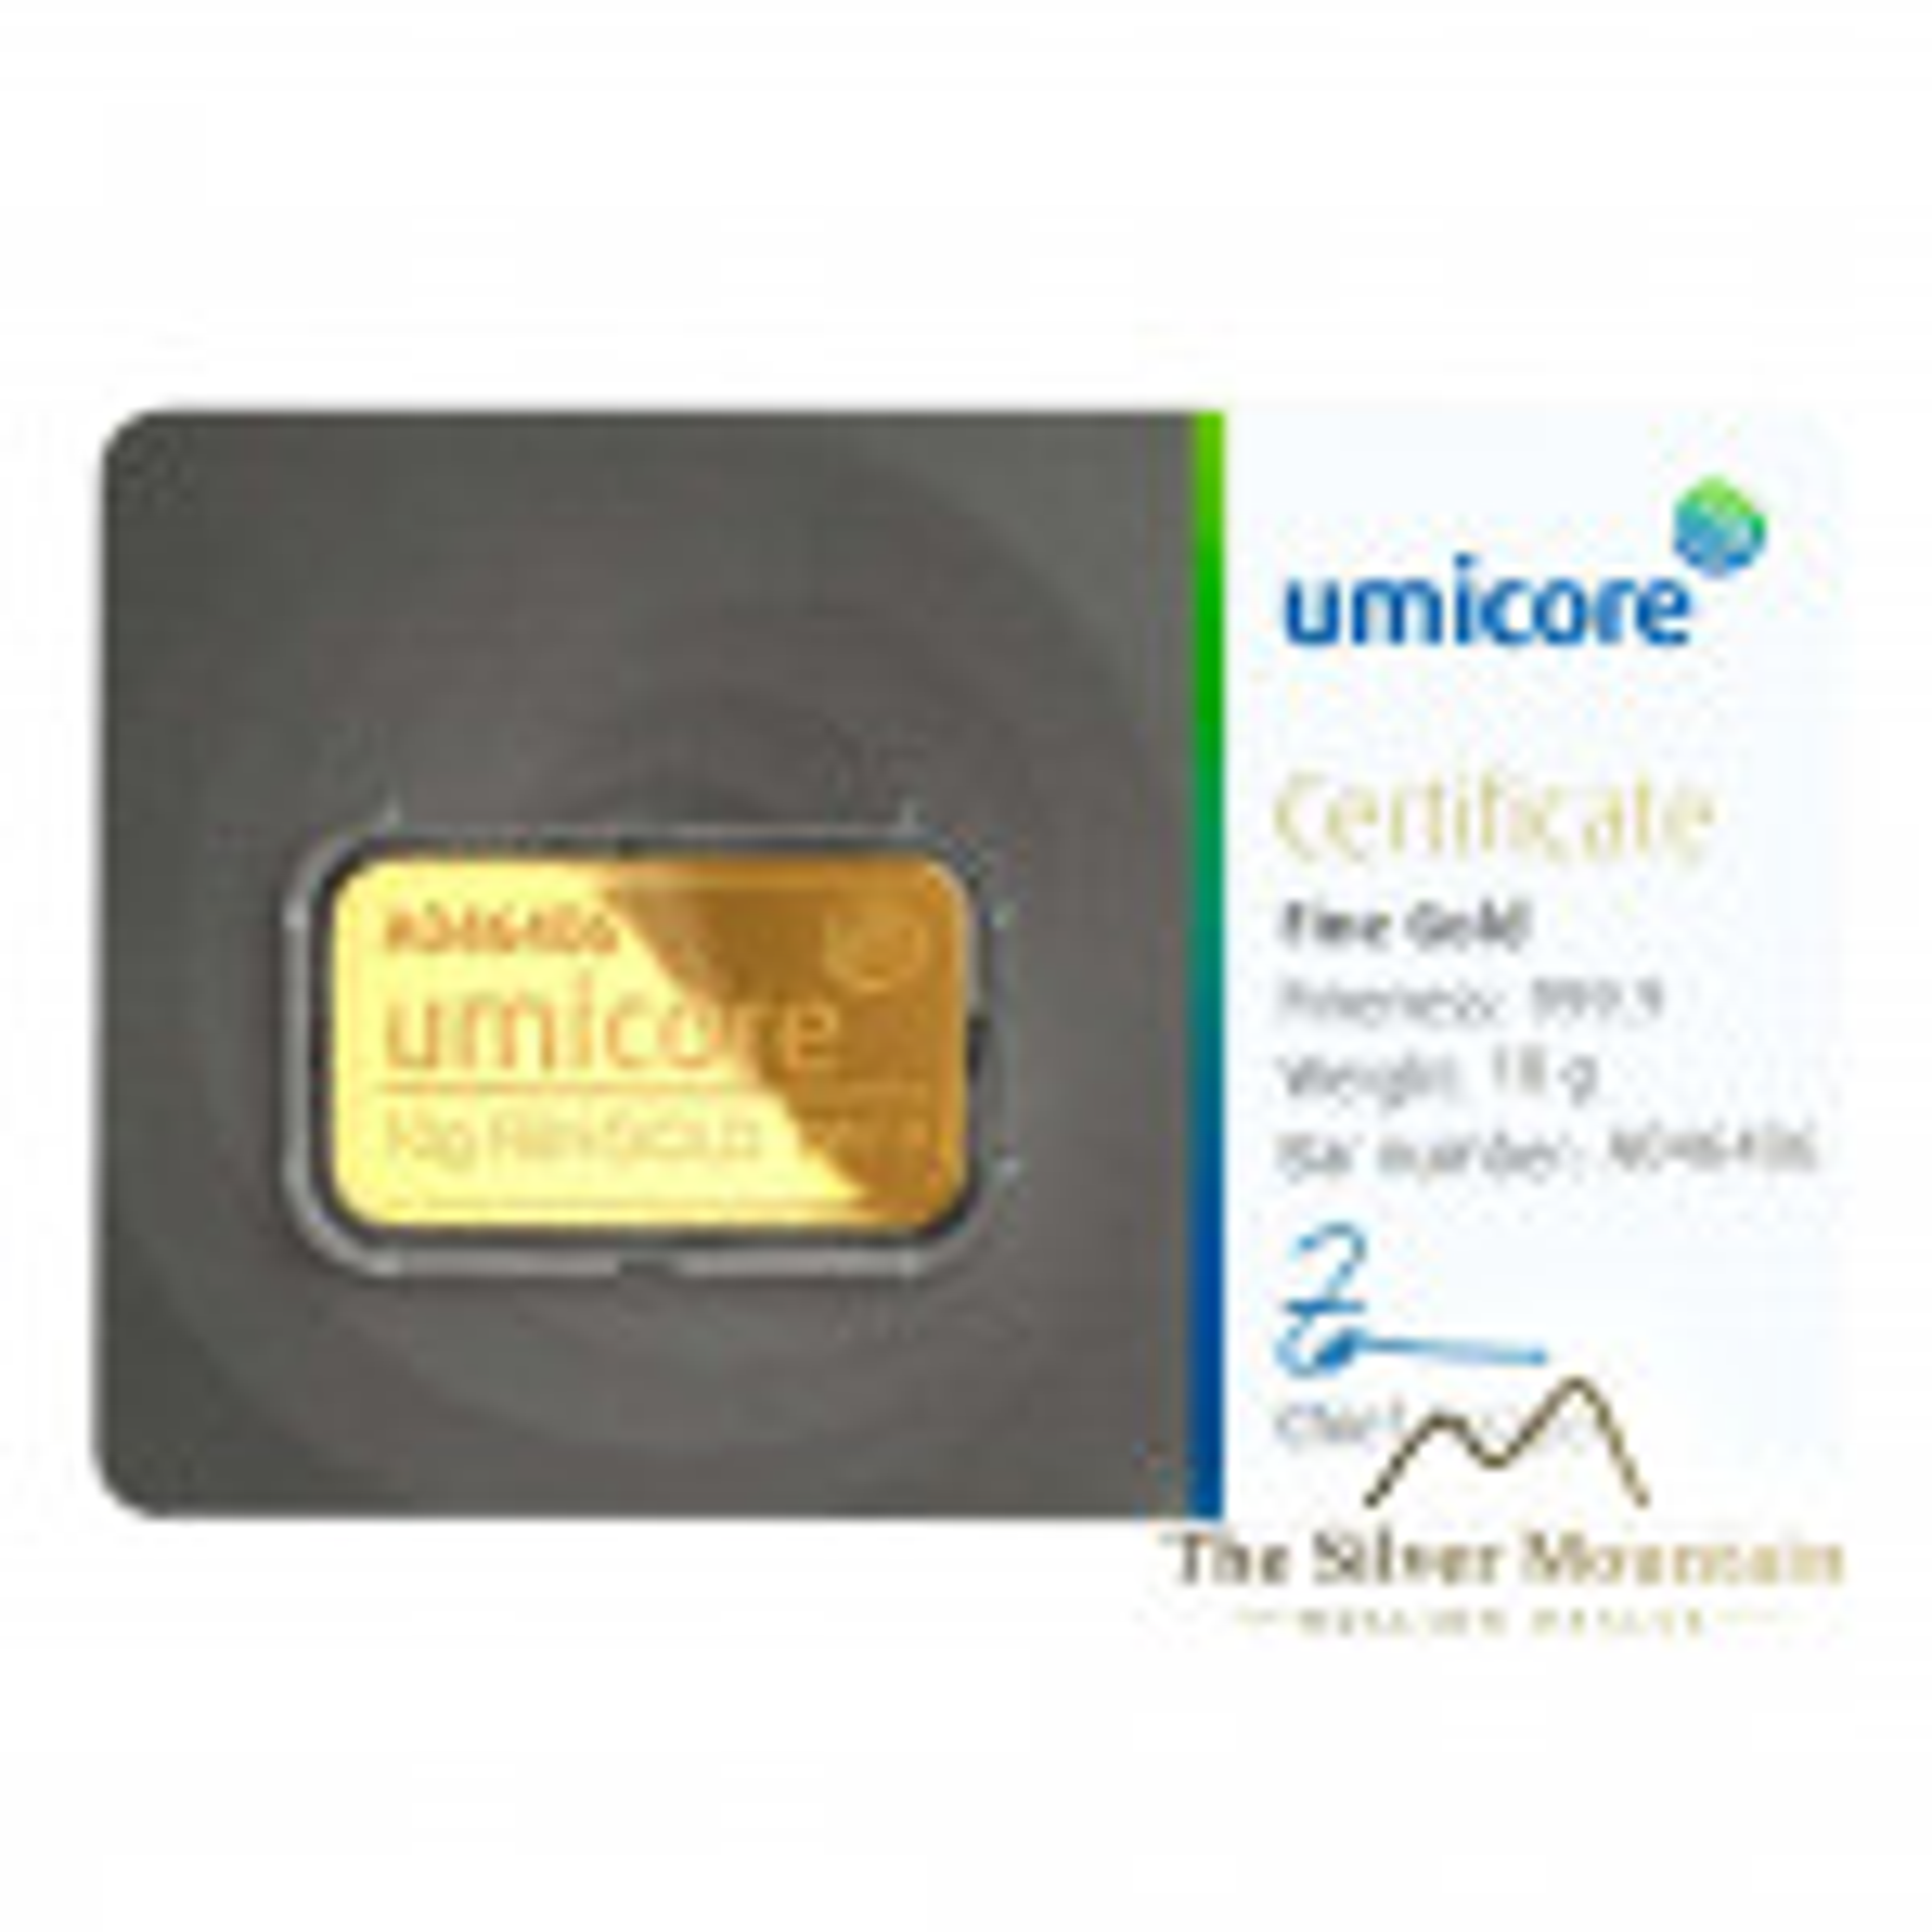 Umicore 10 grams goldbar with certificate